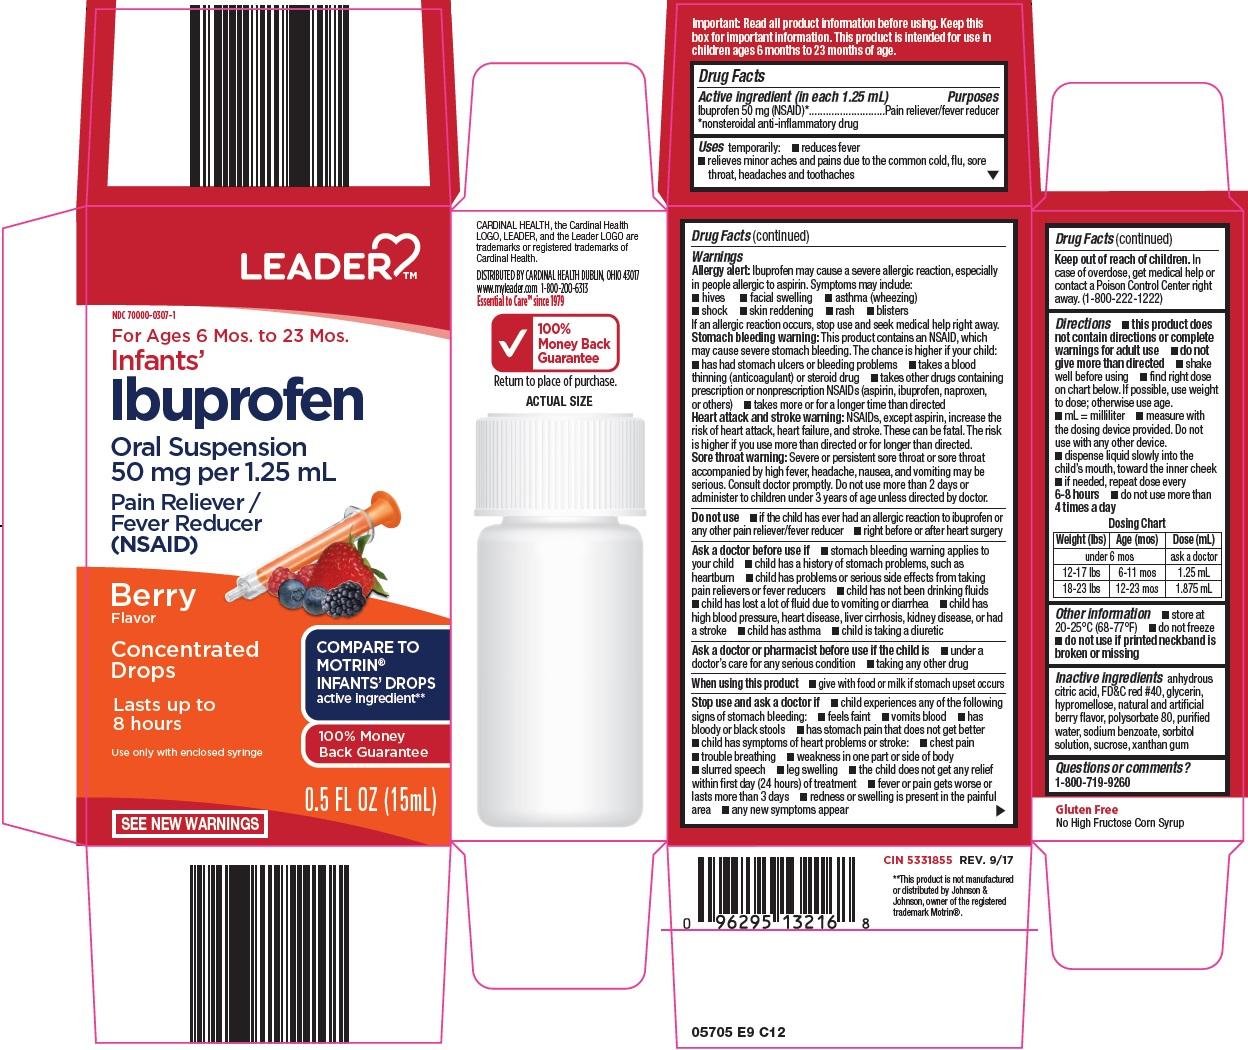 ibuprofen (leader ibuprofen)